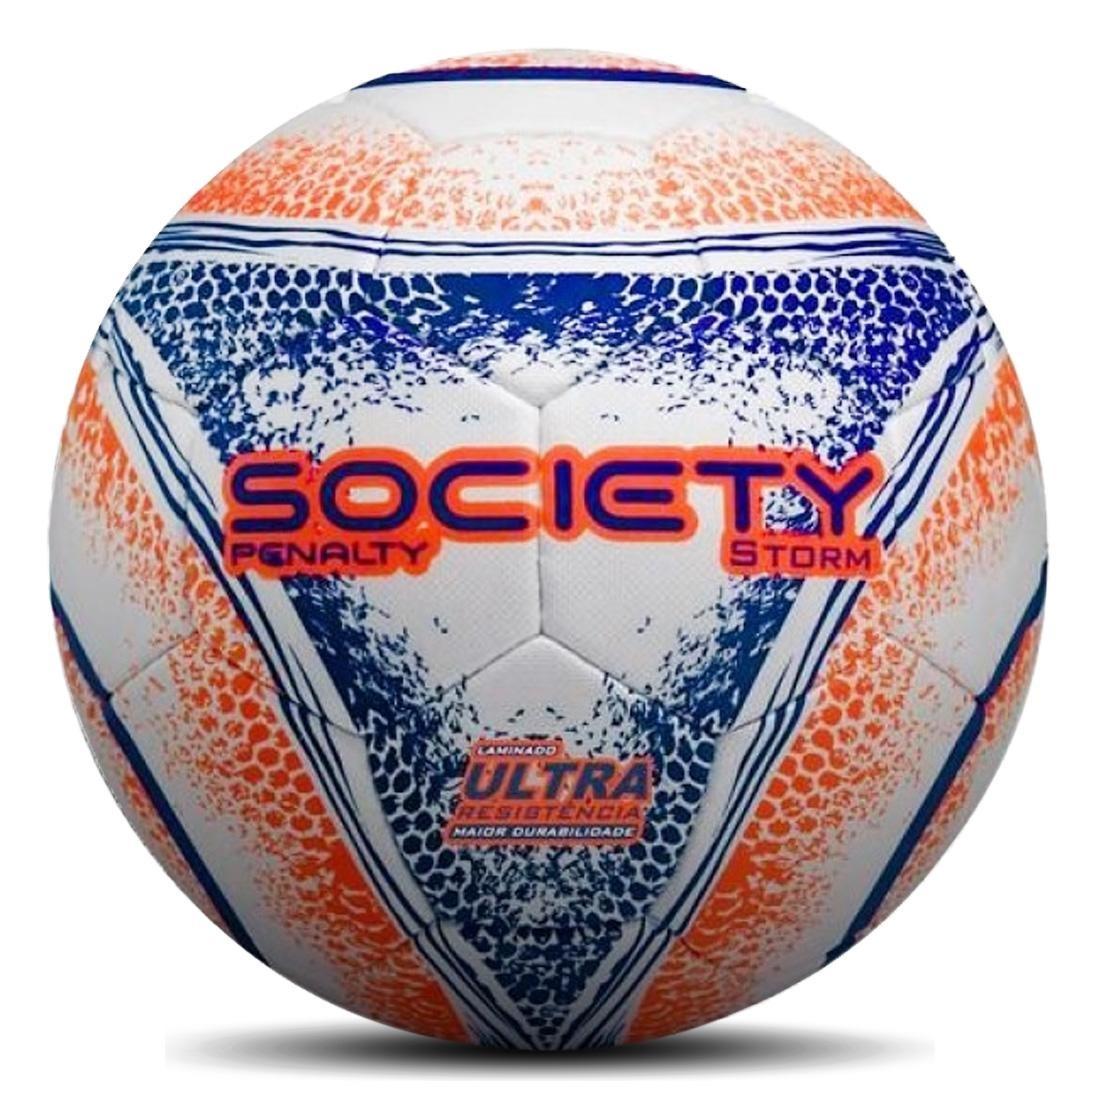 7f26804f12 bola society penalty storm ultra resistencia costurada. Carregando zoom.